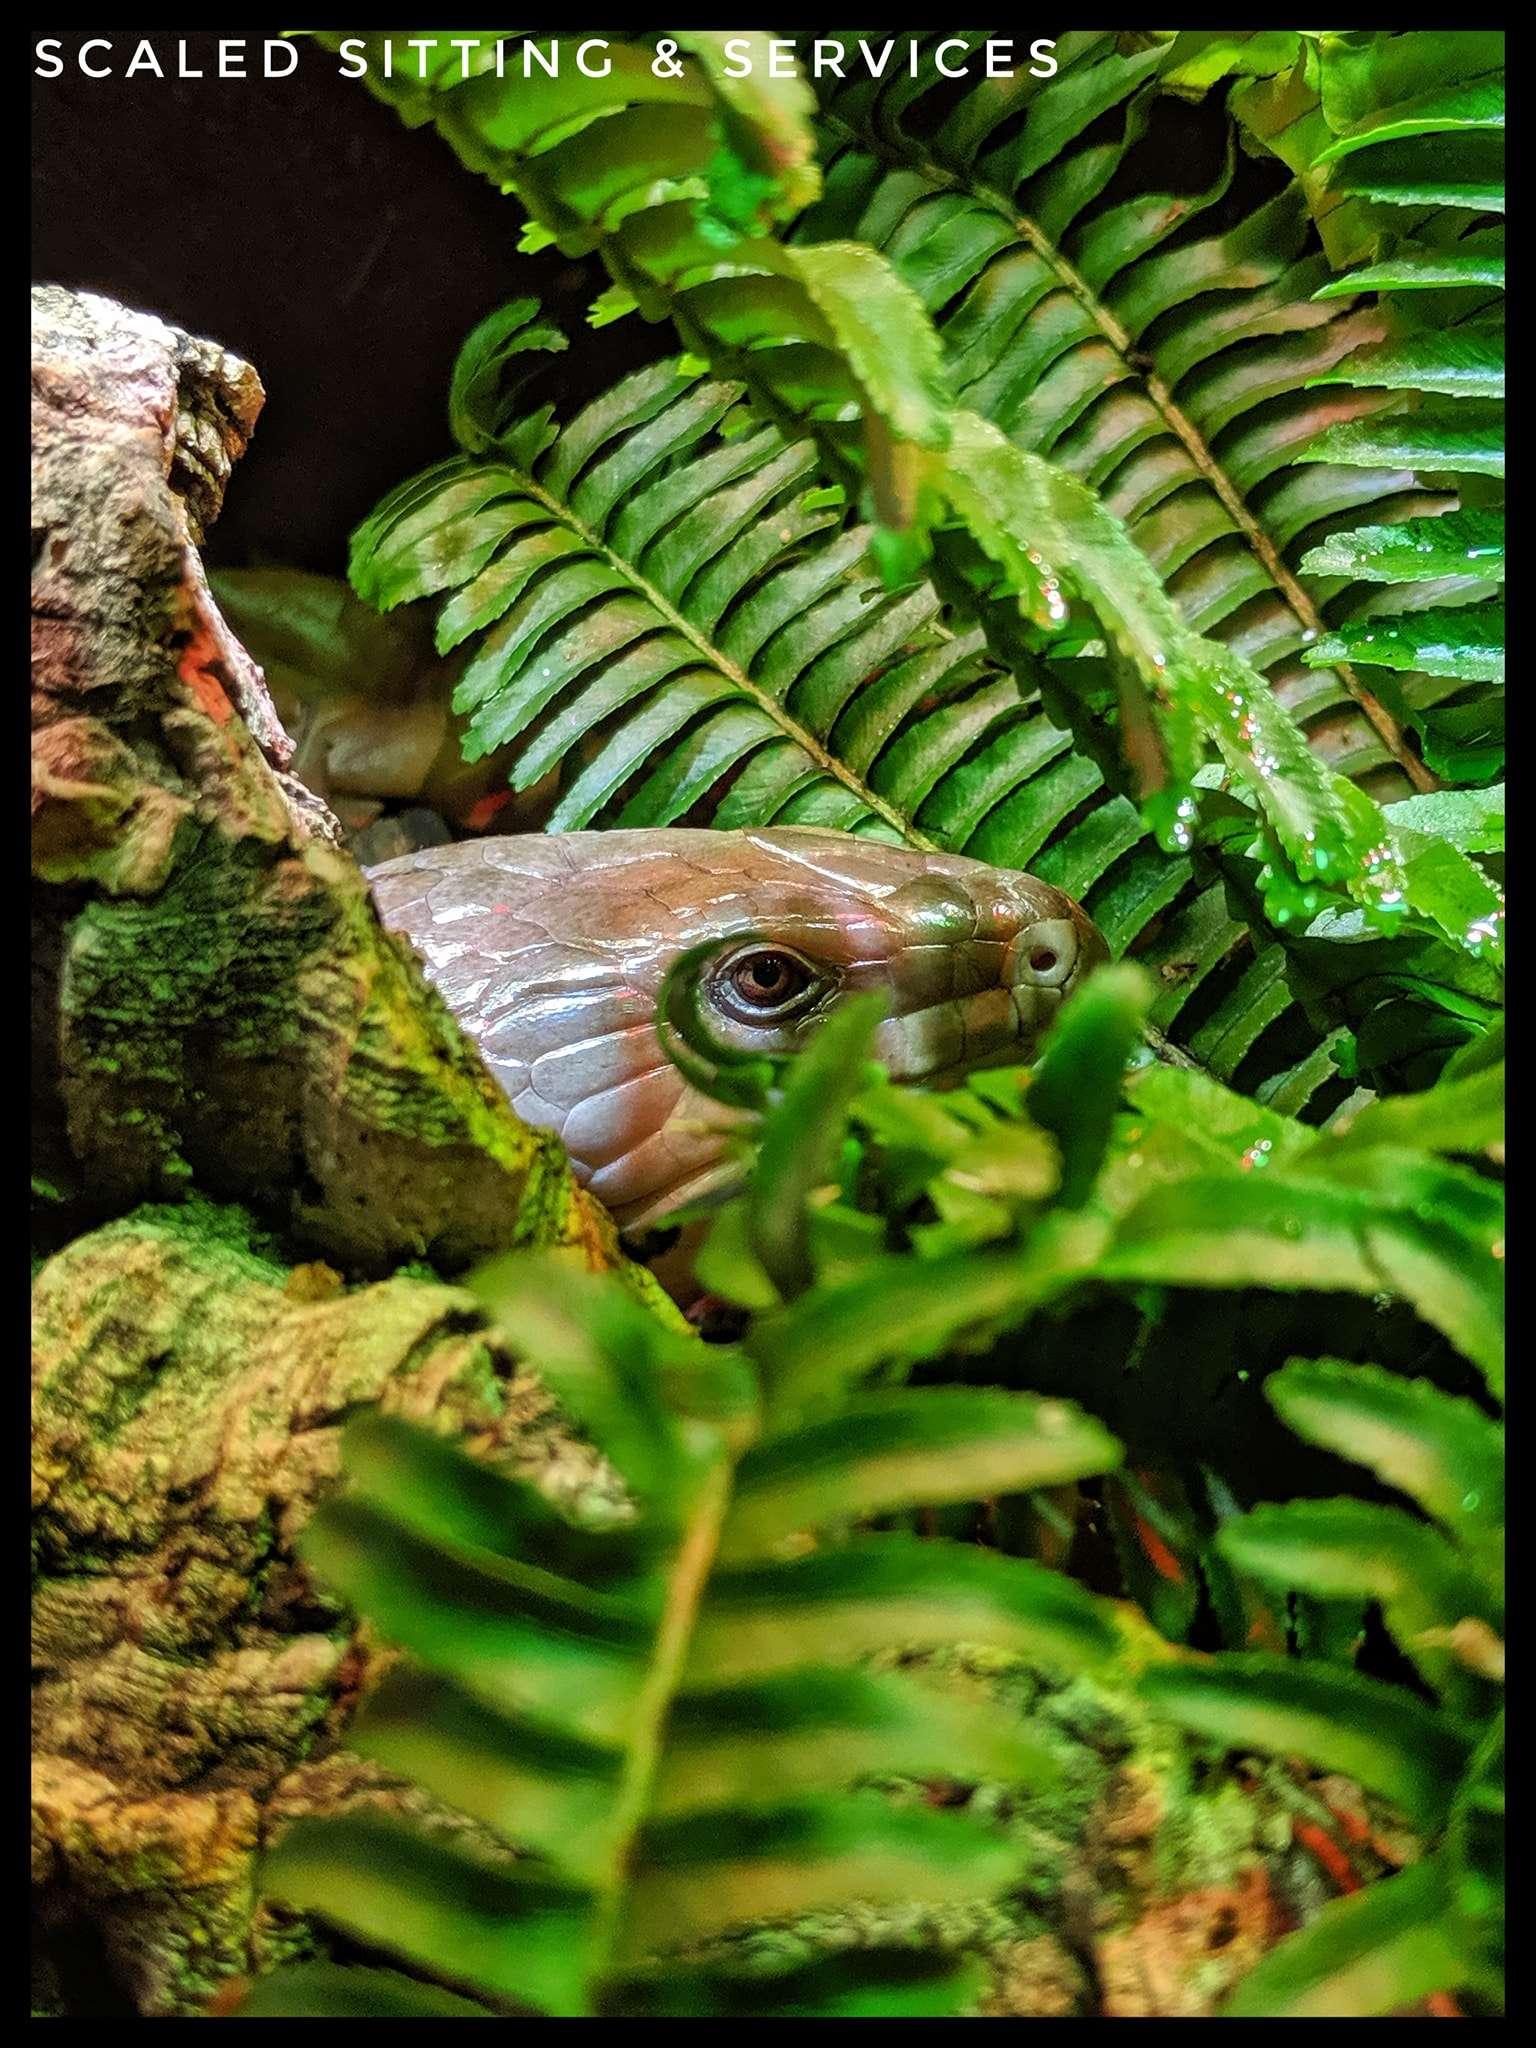 blue tongue skink hiding behind green fern